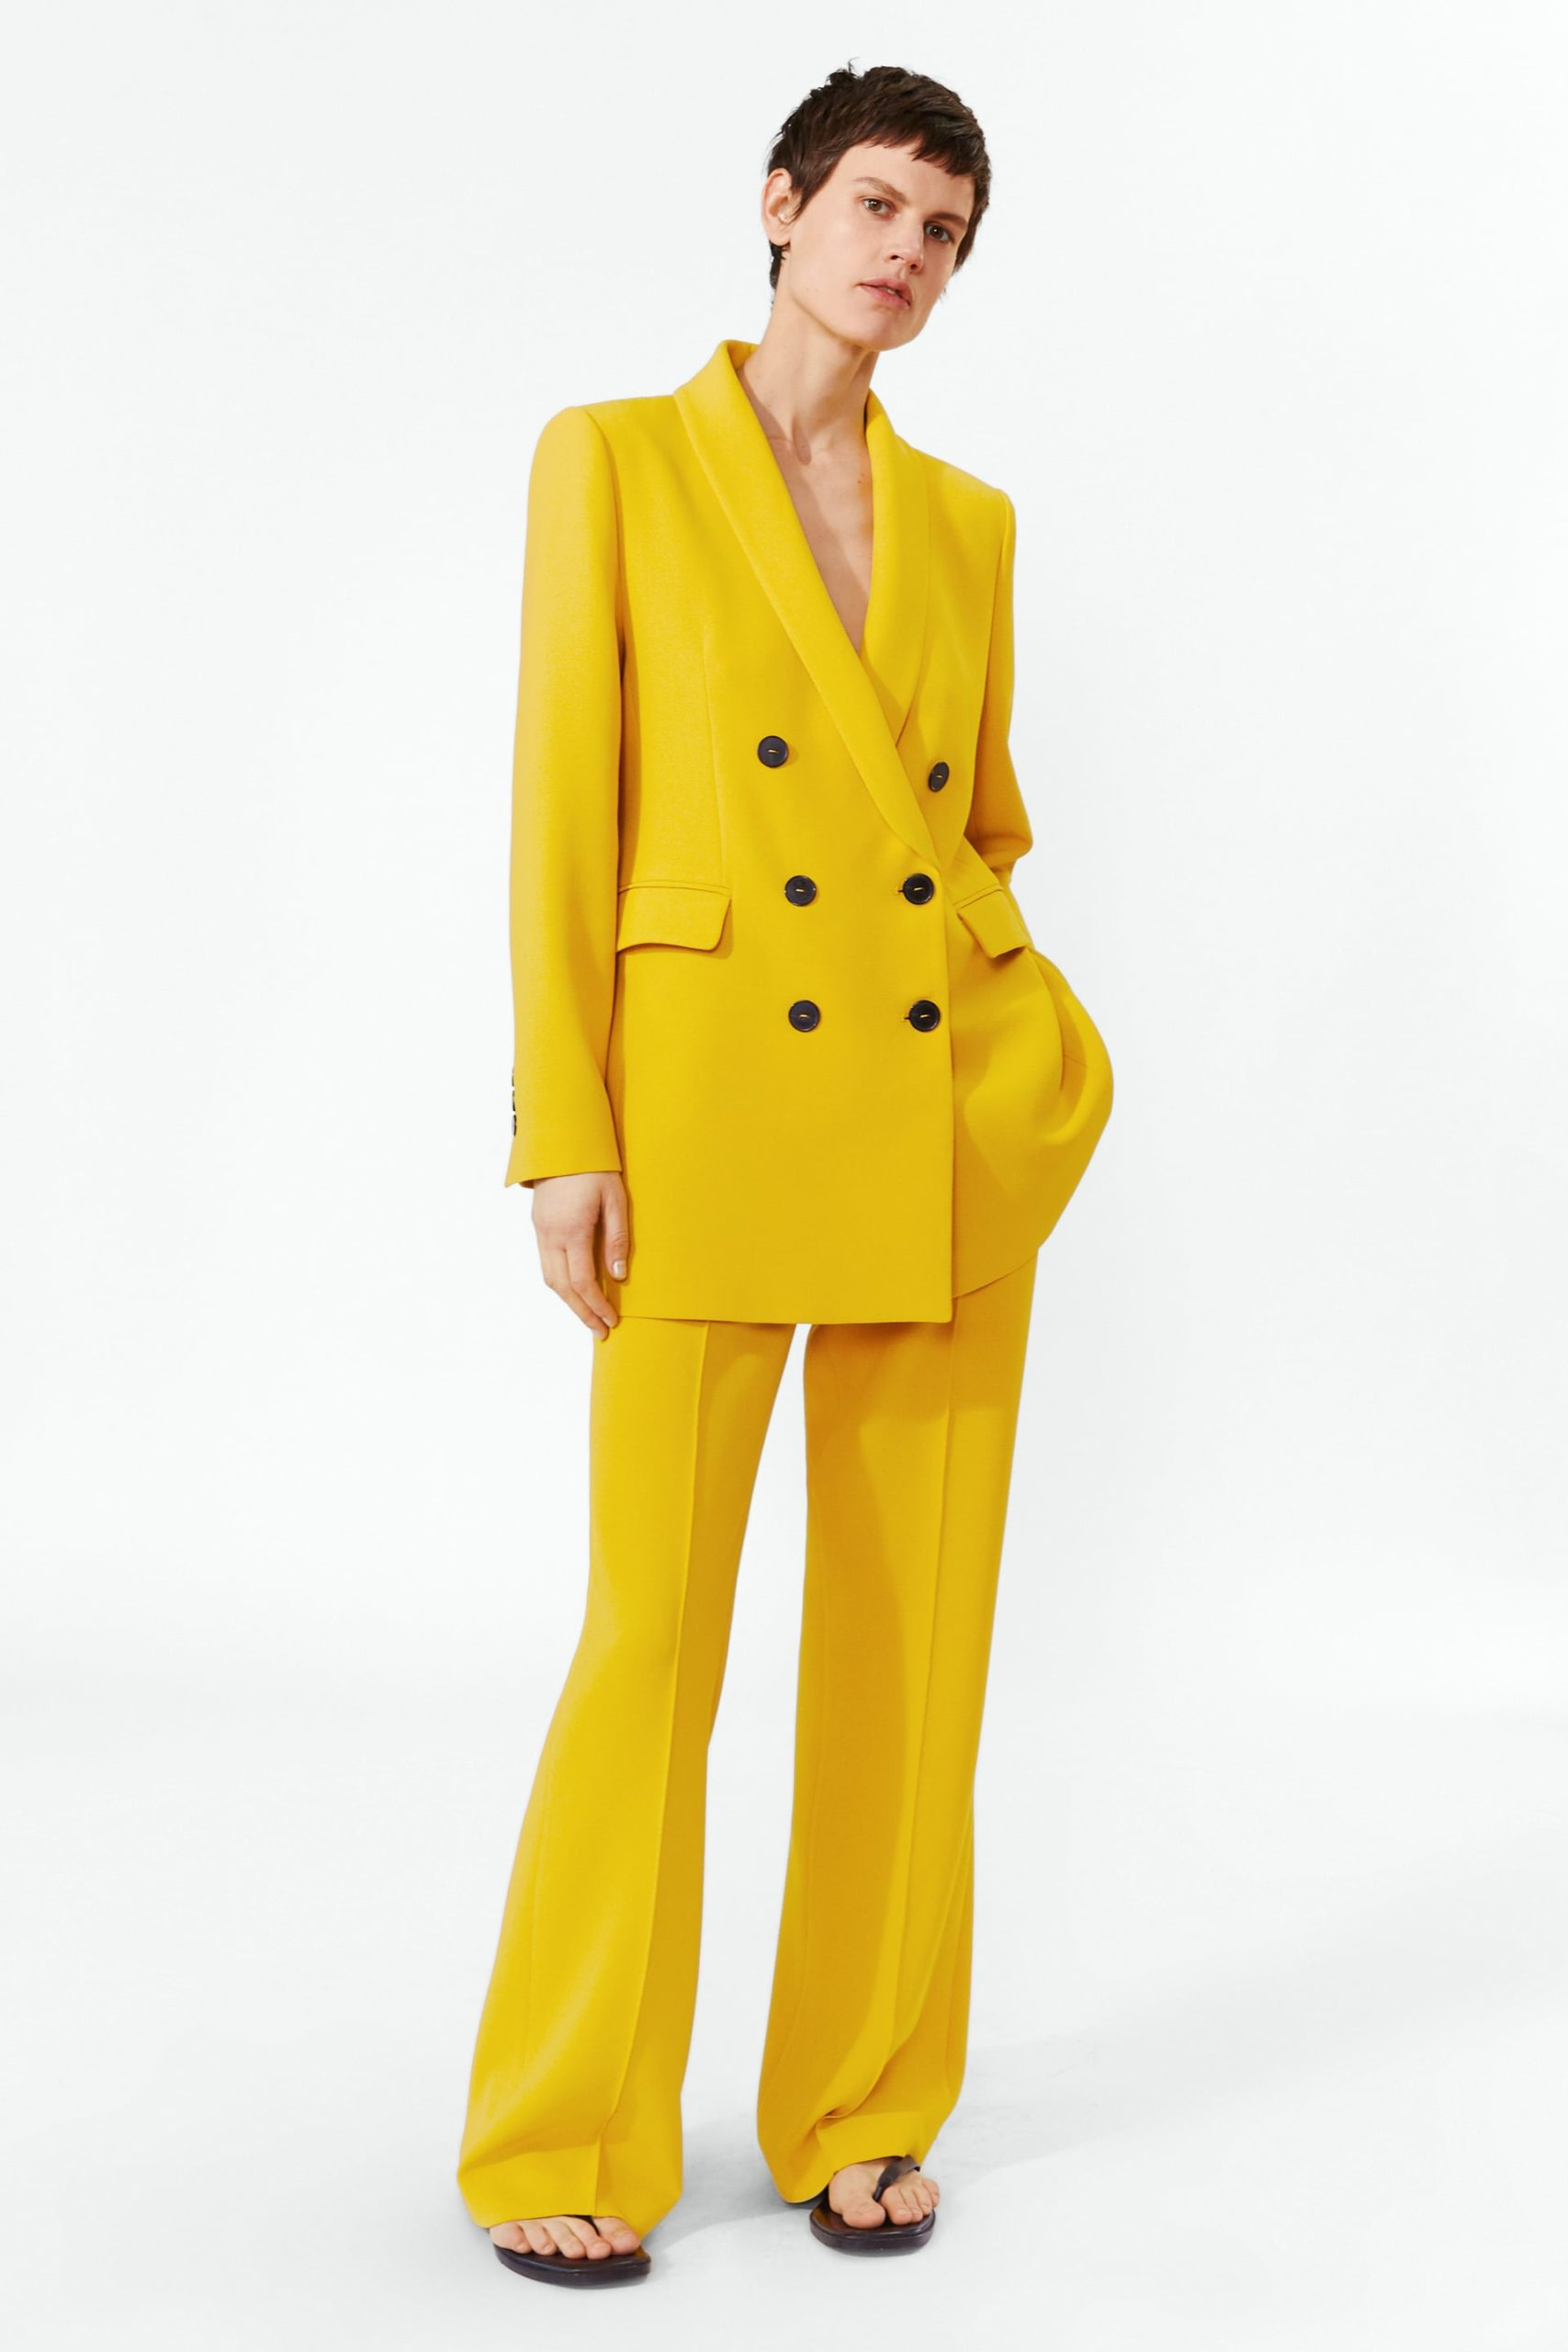 Tailleur pantalone giallo di Zara